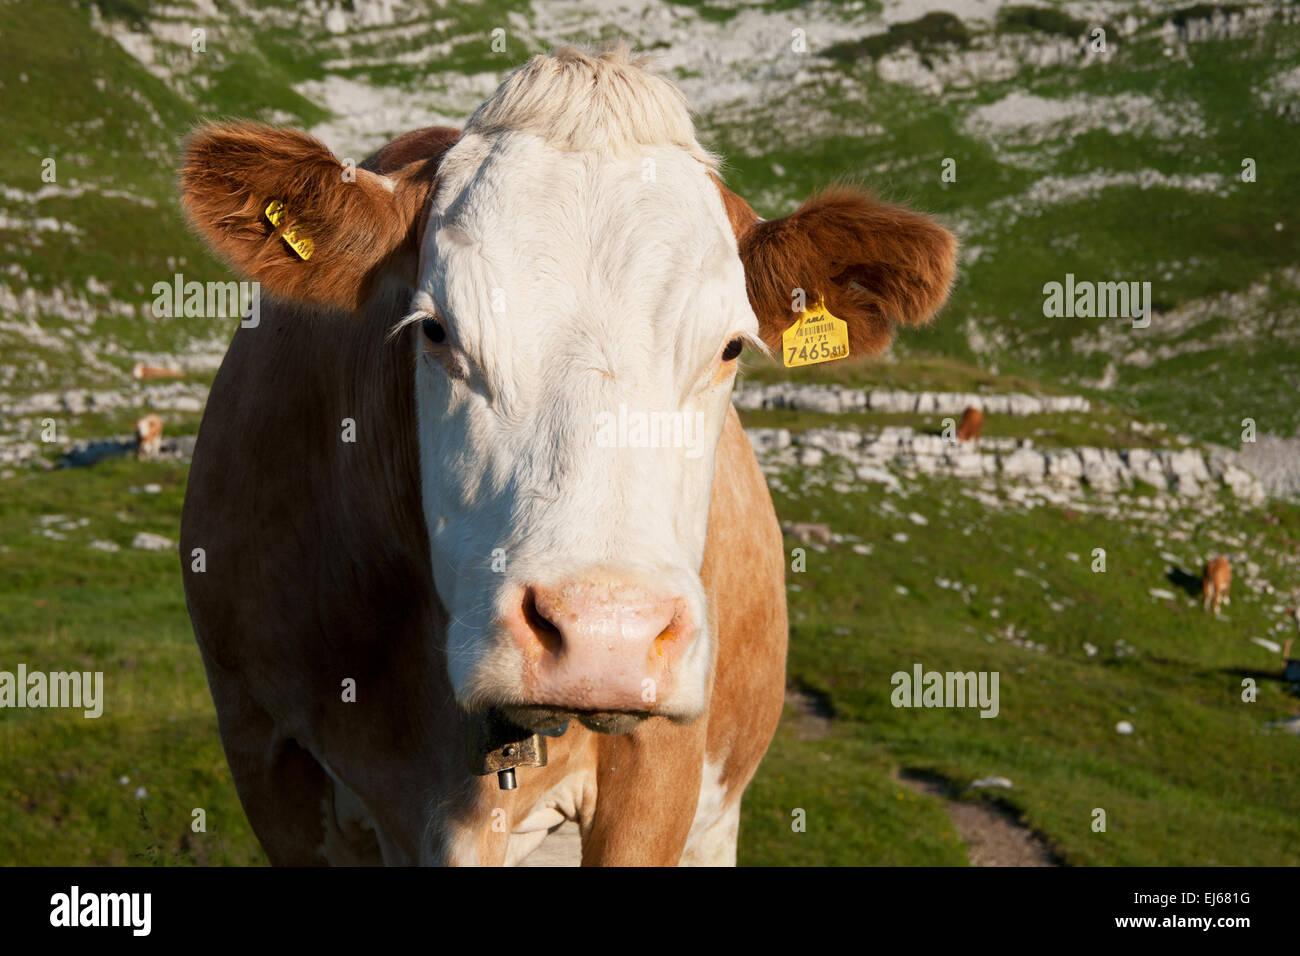 Kuh am Loser, Altaussee, Salzkammergut, Styria, Austria - Stock Image